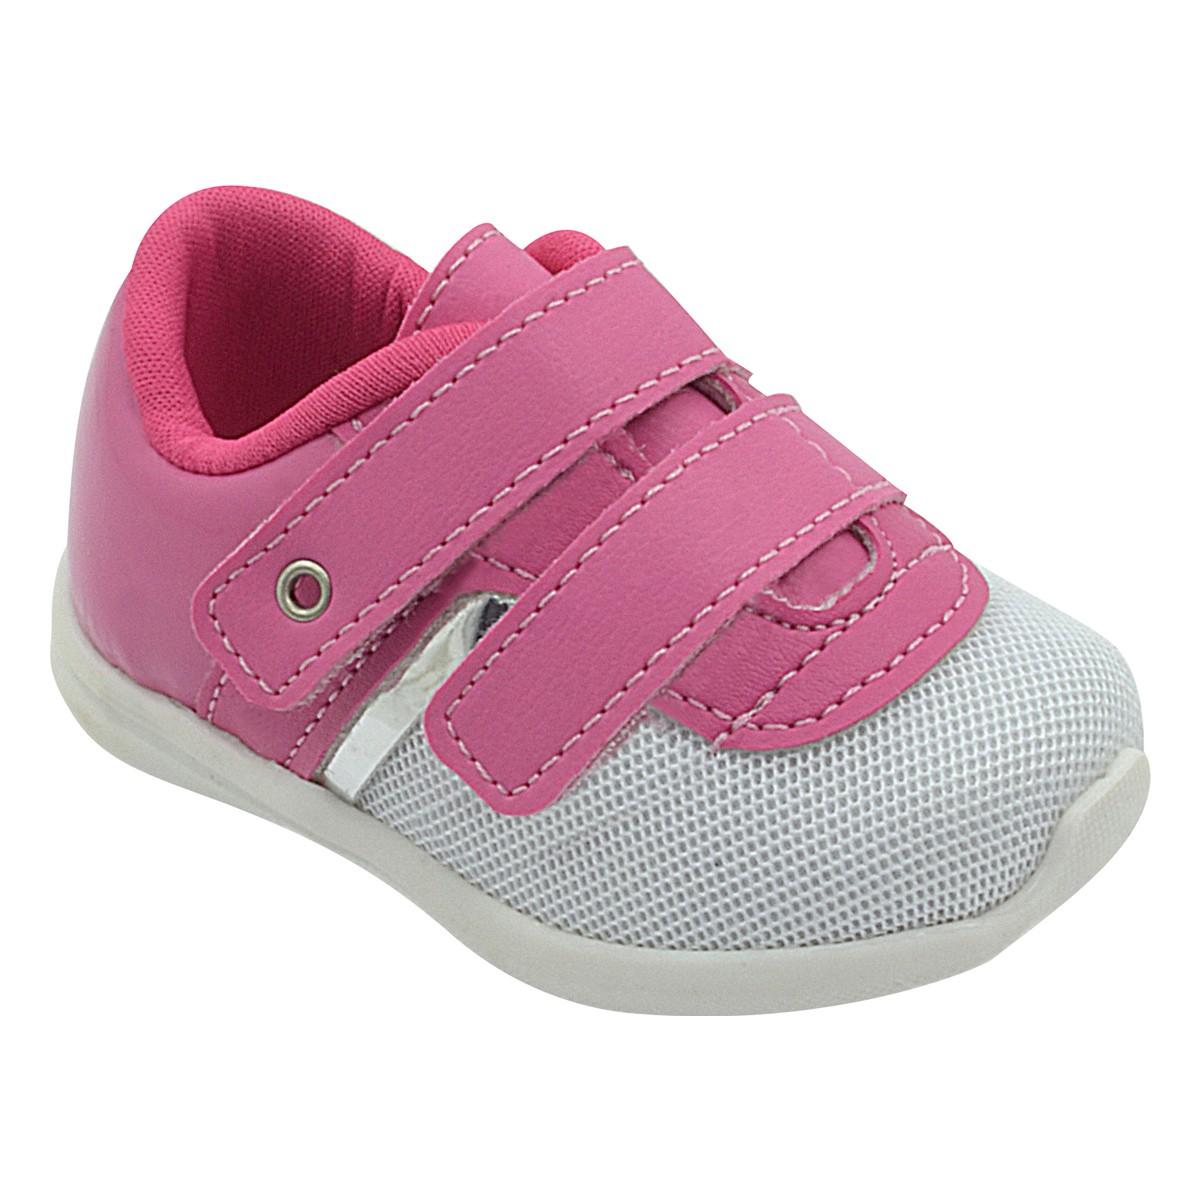 Tênis Infantil Pé com Pé Calce Fácil Velcro Pink Menina